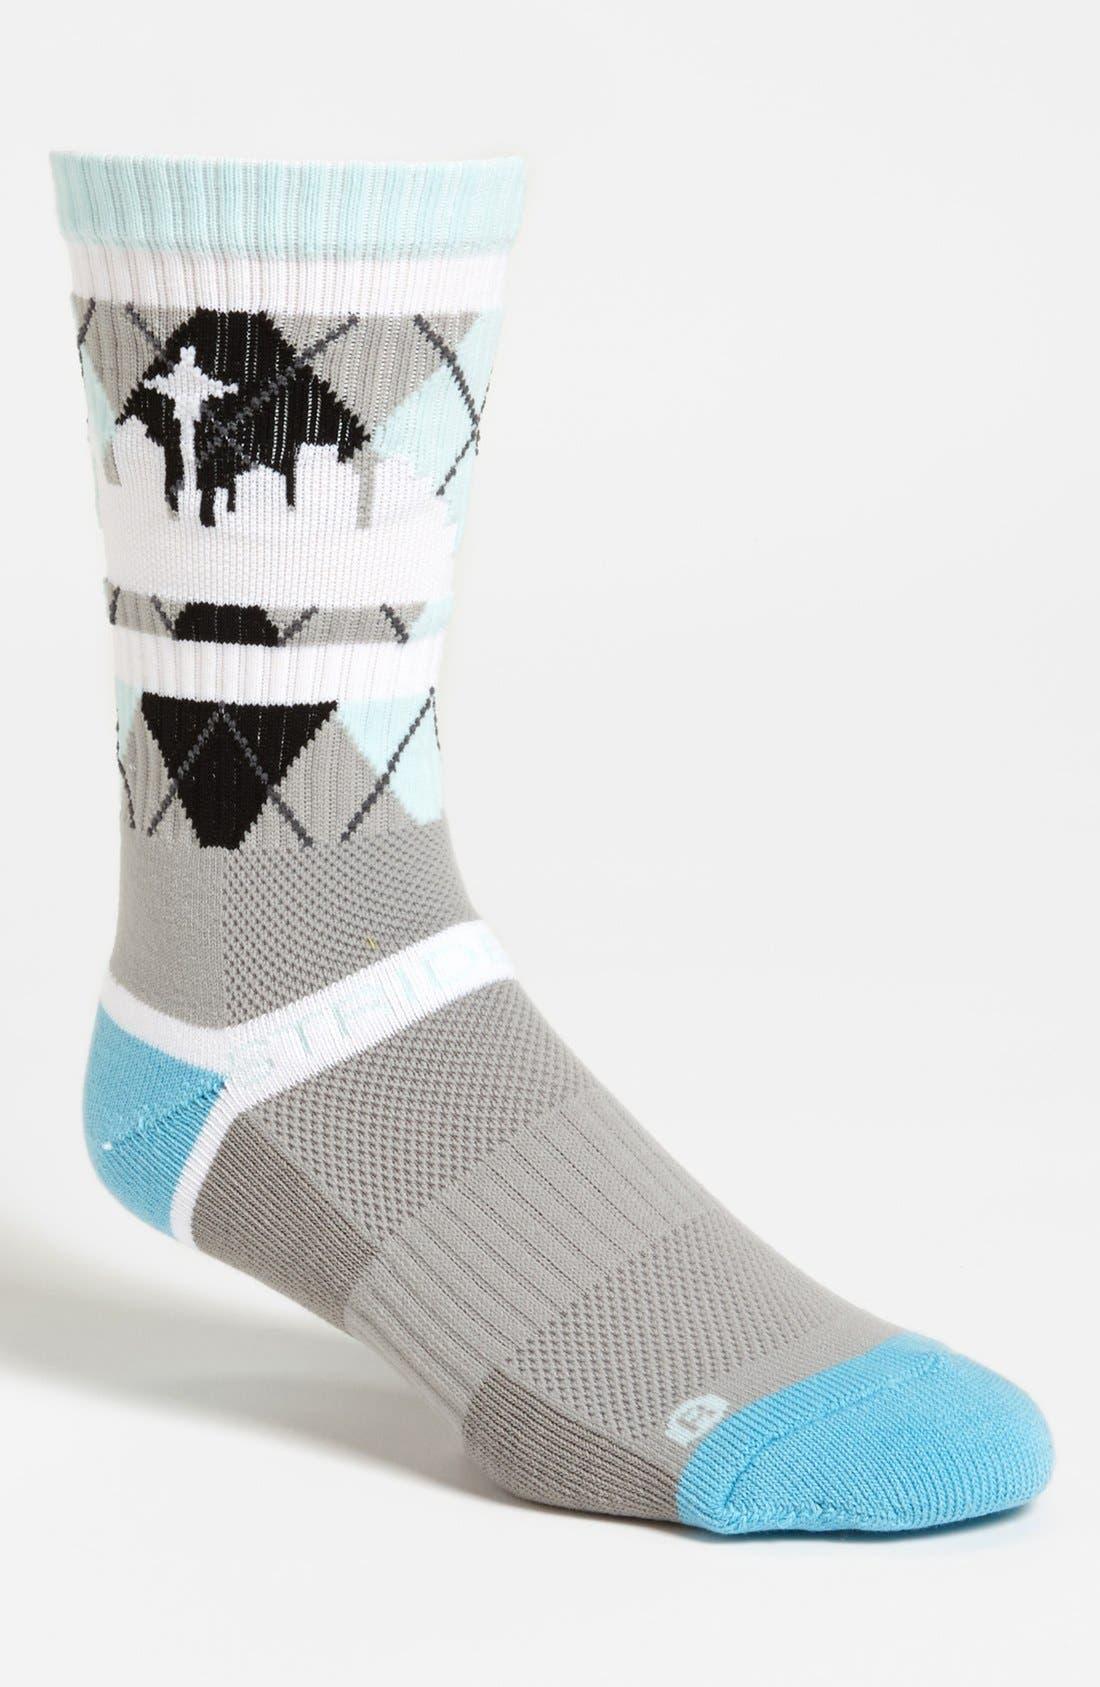 Main Image - STRIDELINE 'Seattle' Socks